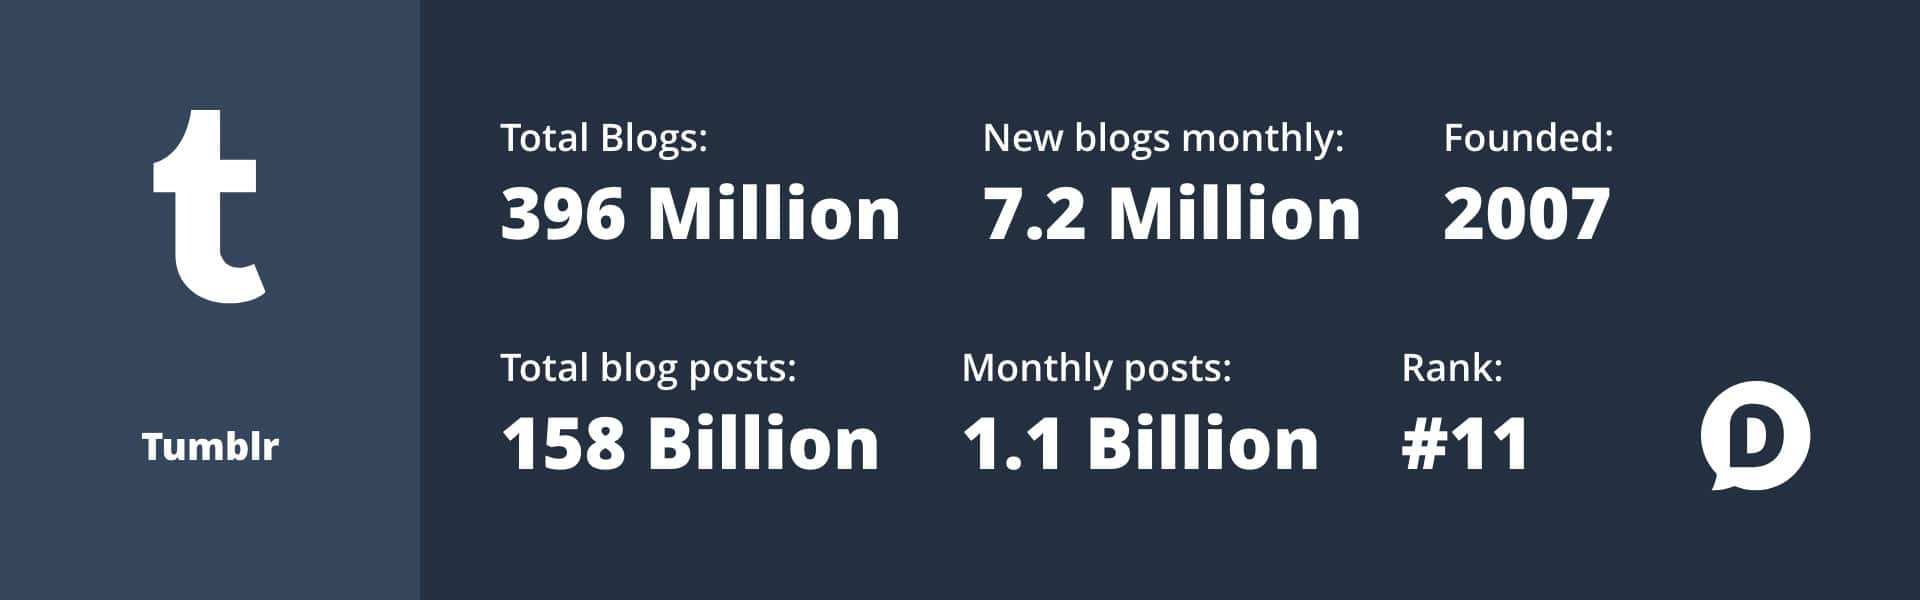 tumblr statistics for 2018